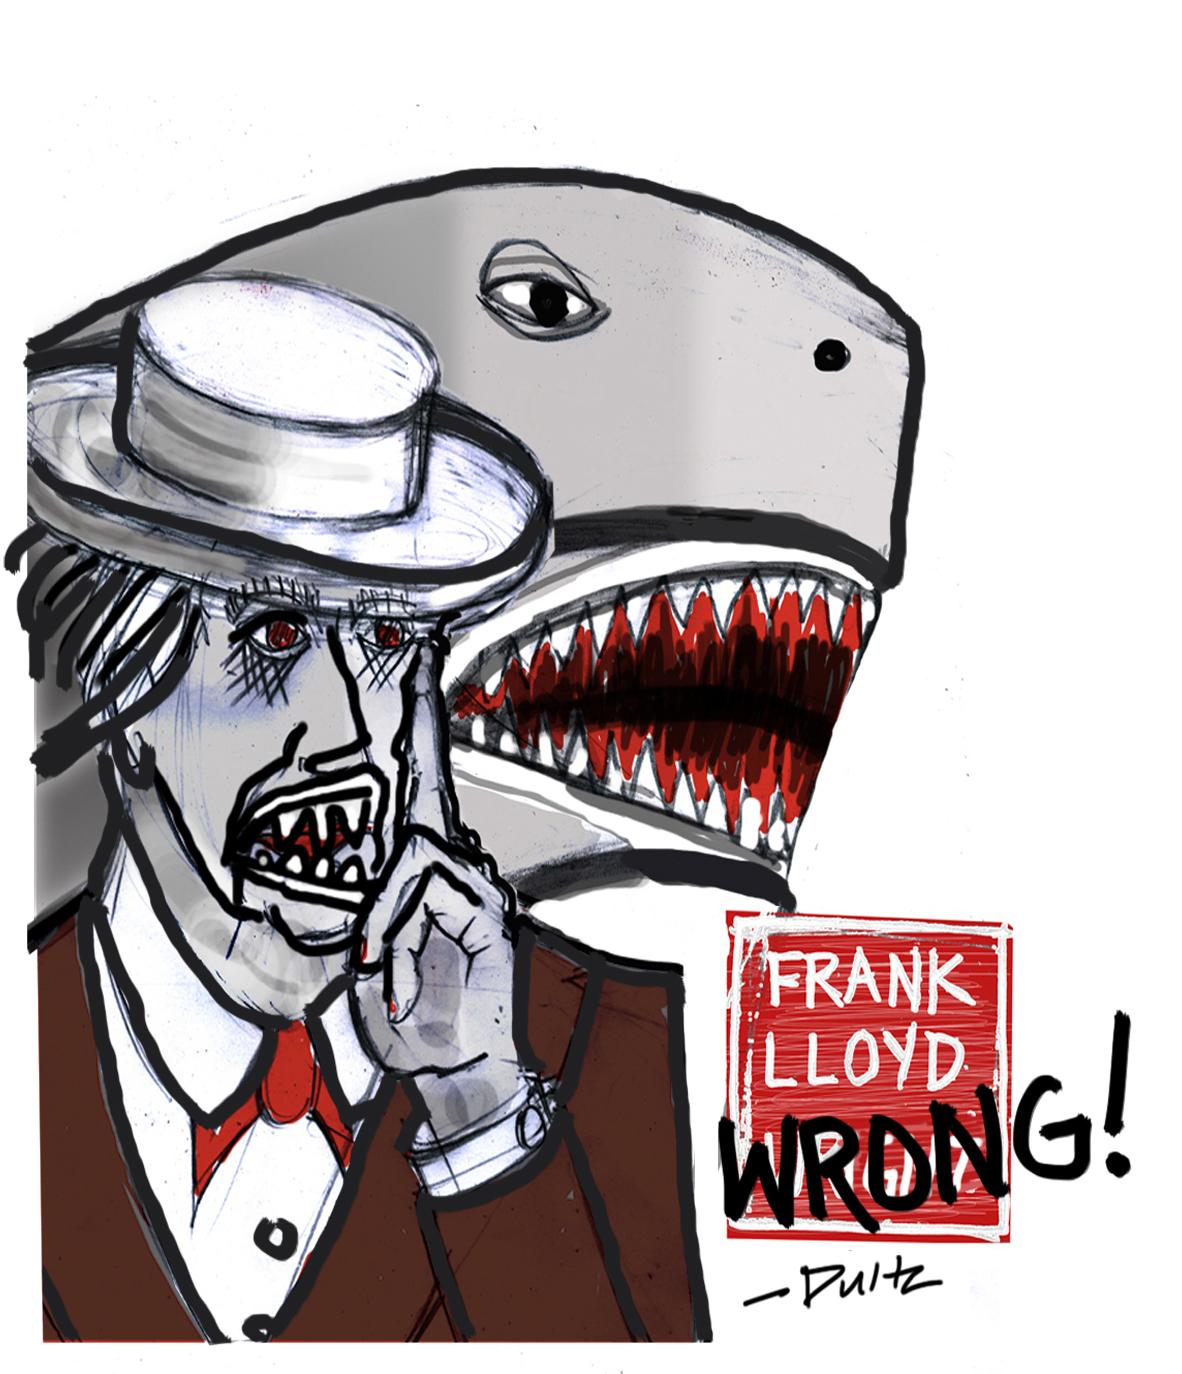 frank lloyd wrong copy copy